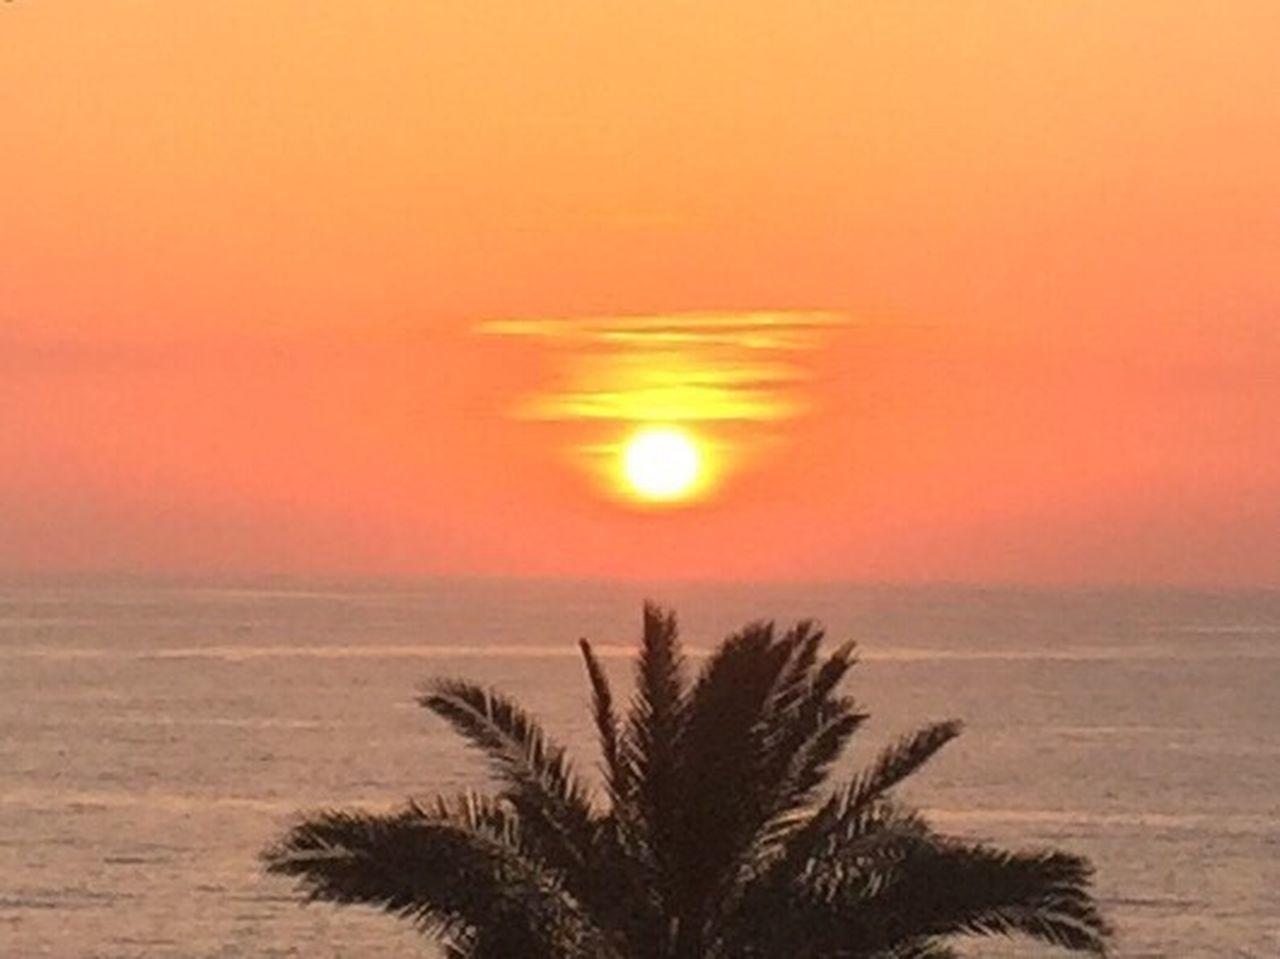 Sunset Nature Beauty In Nature Scenics Sea Tranquil Scene Sky Sun Beach No People Halat Lebanon